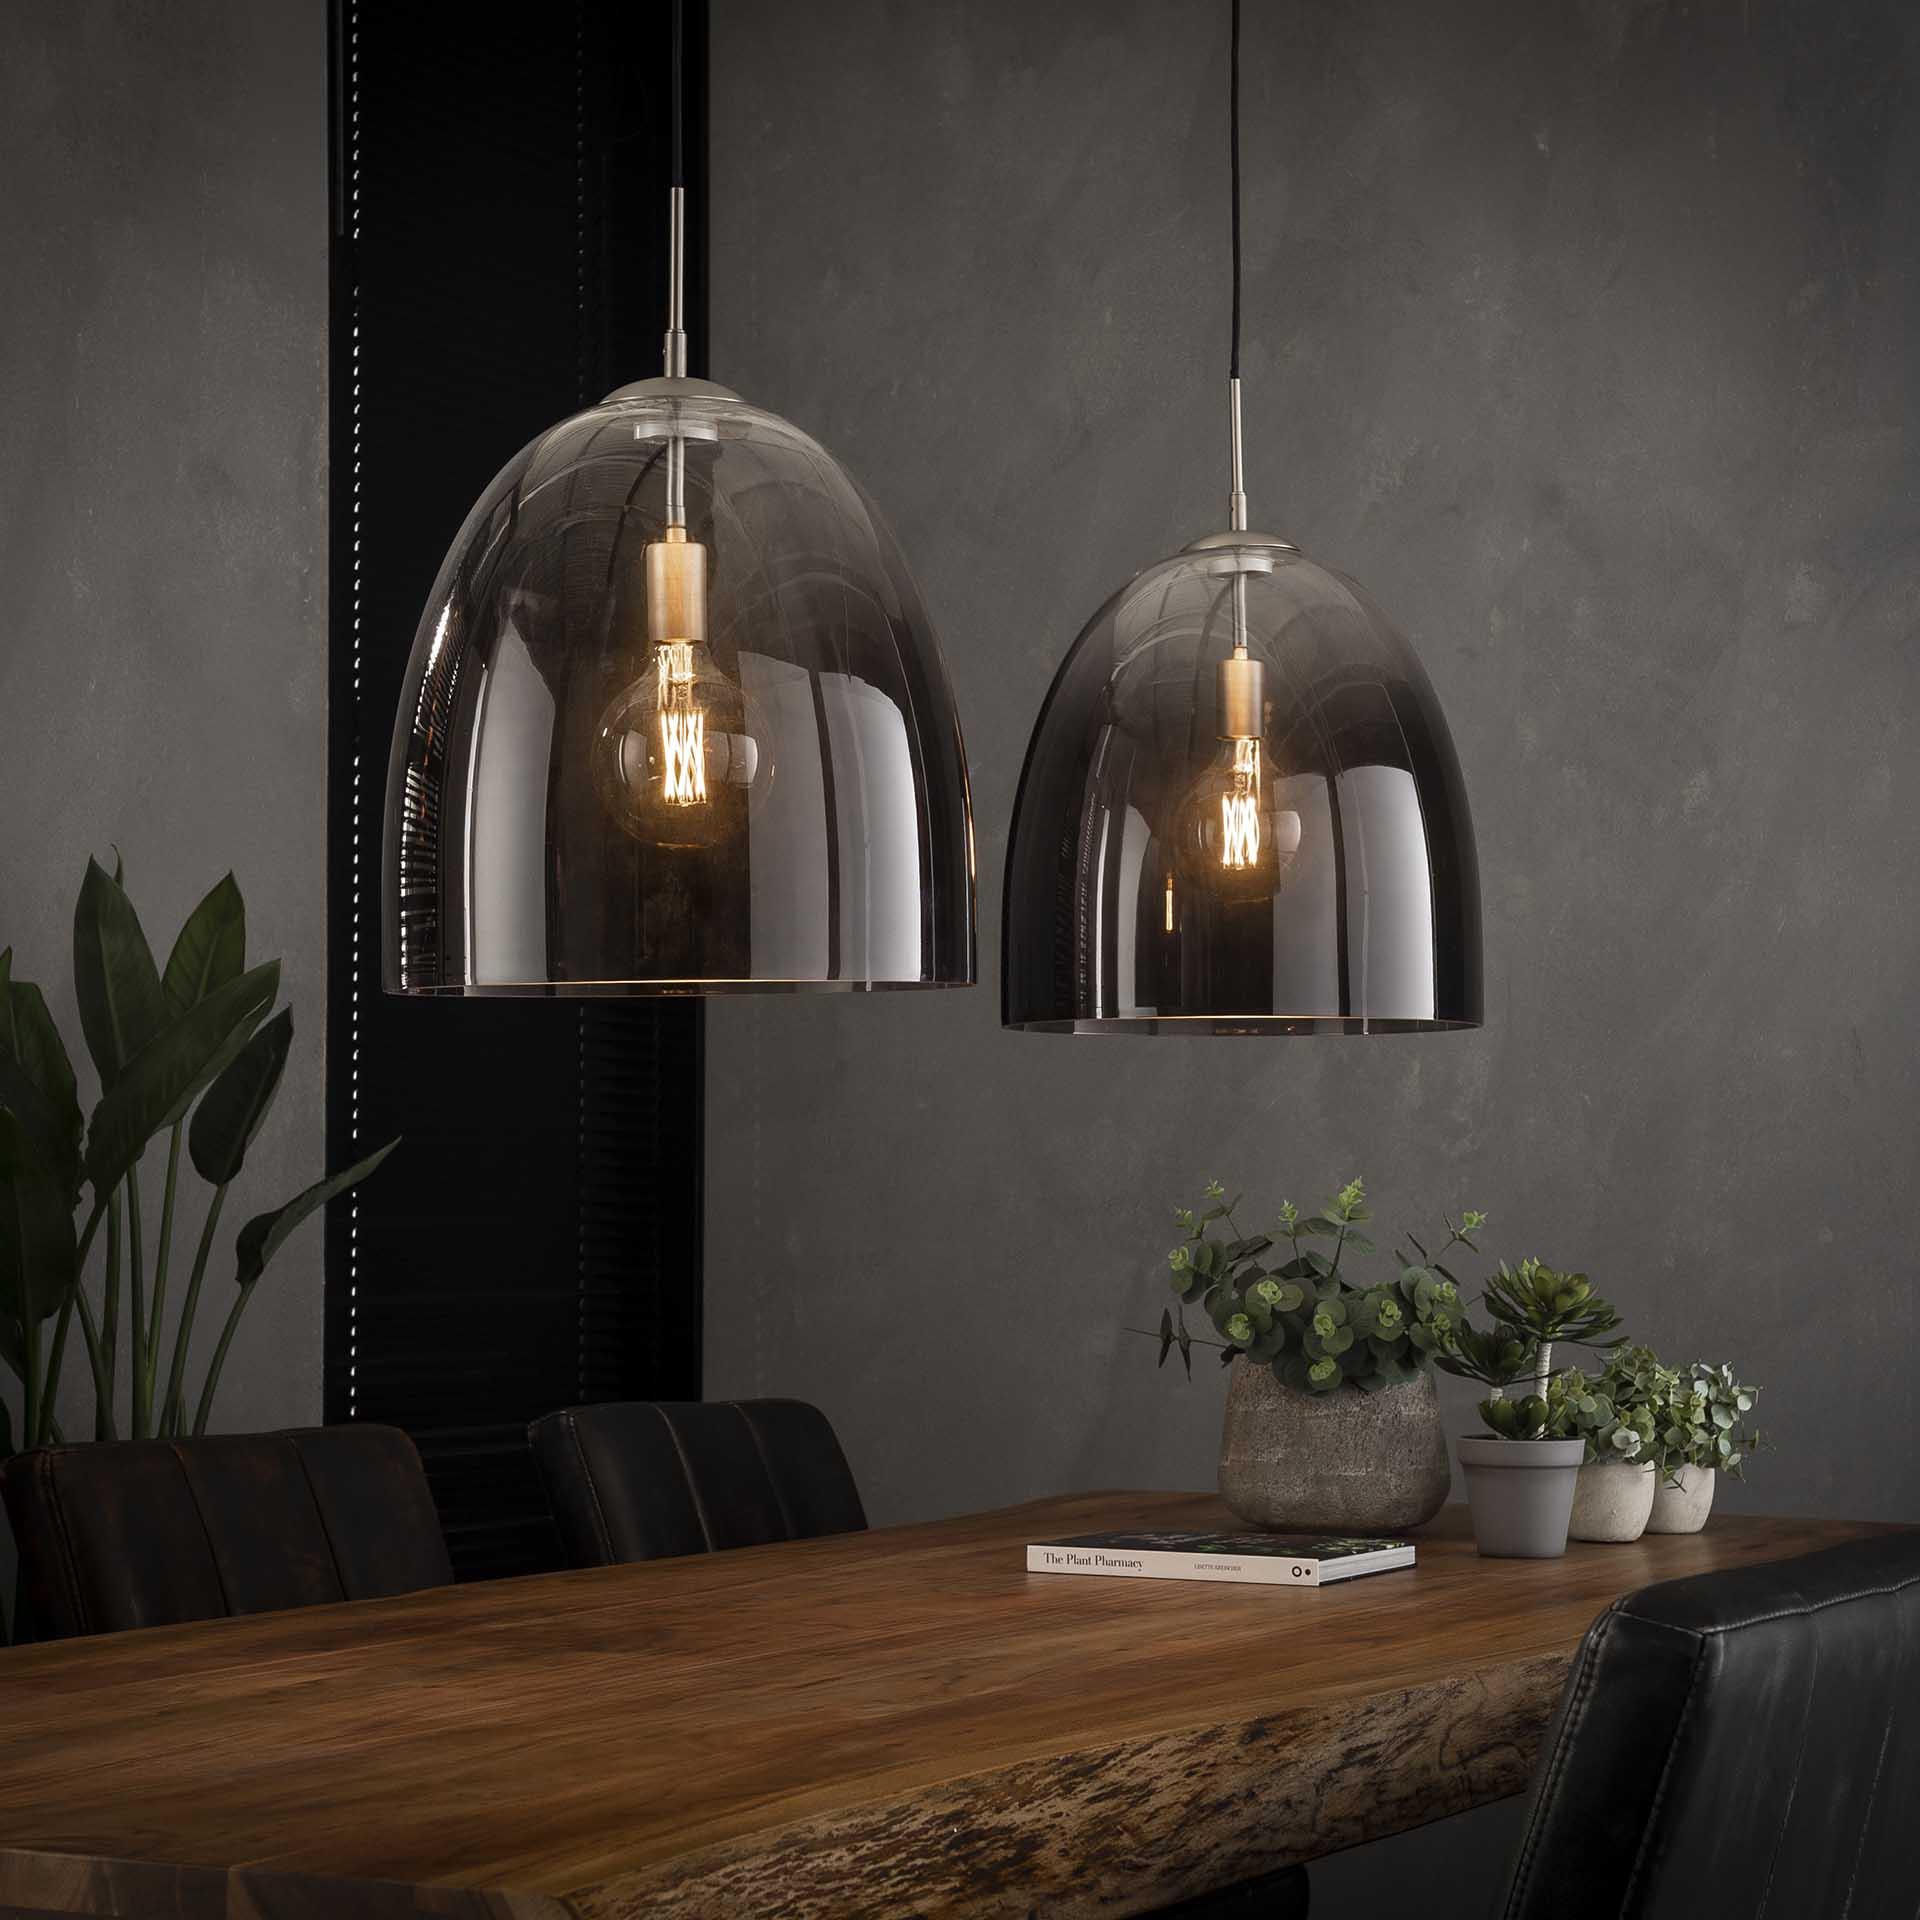 Hanglamp 2x 40 shaded ovaal glas - Mat nikkel